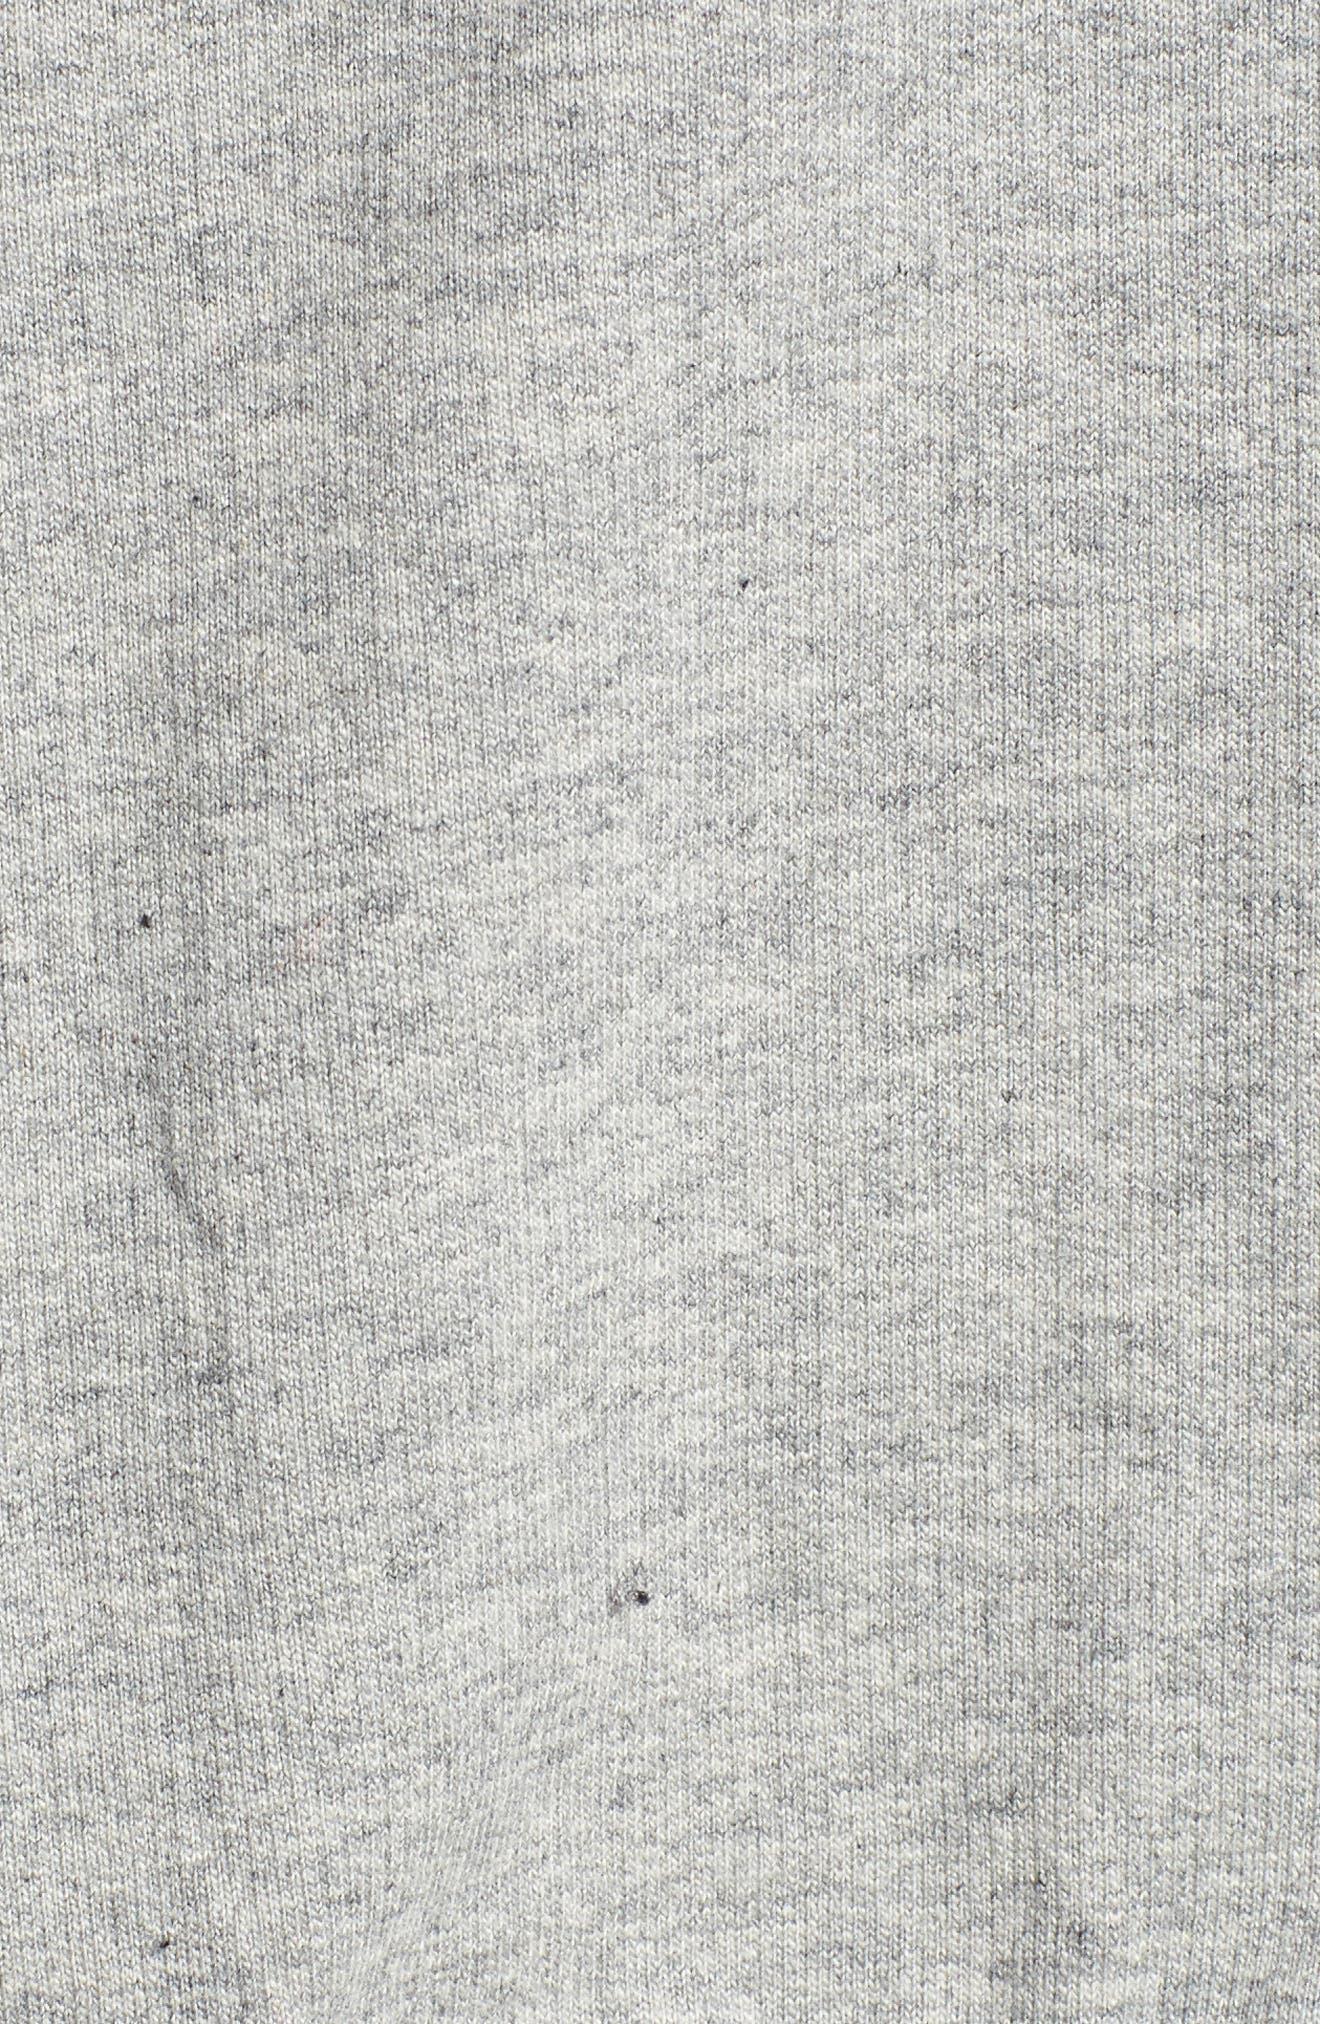 Bamm Bamm Crop Sweatshirt,                             Alternate thumbnail 18, color,